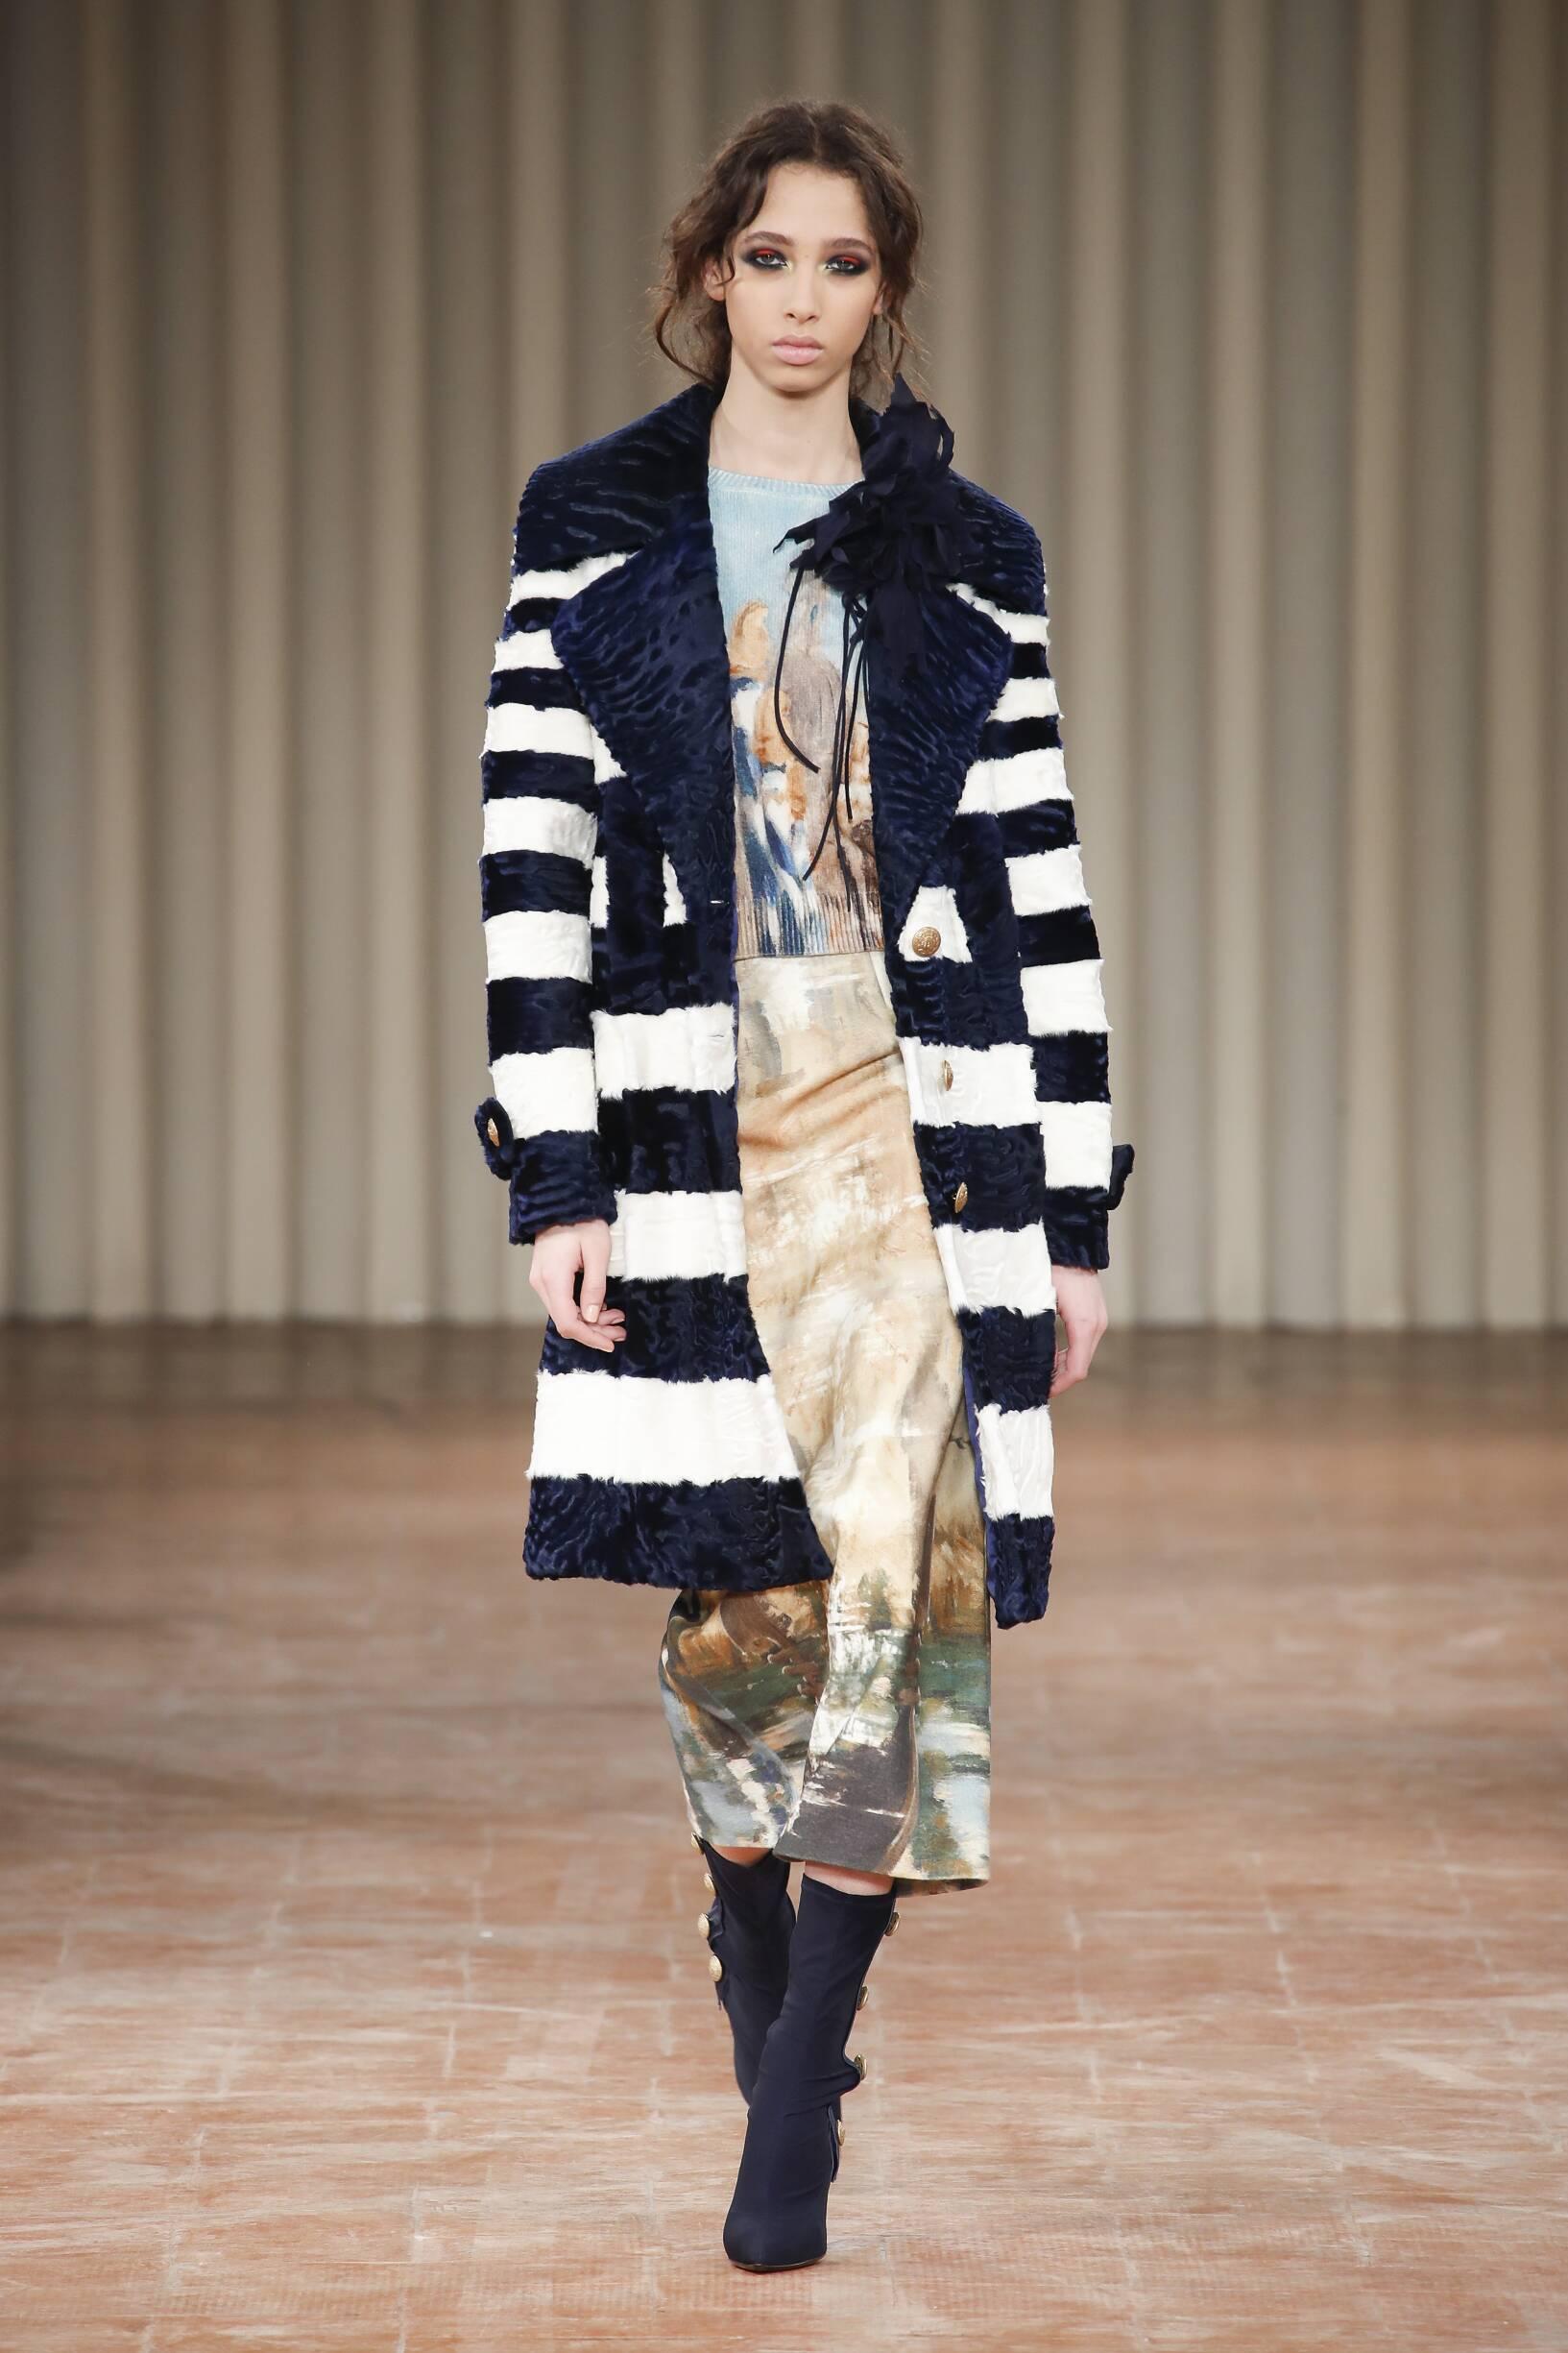 Woman FW 2017 18 Fashion Show Alberta Ferretti